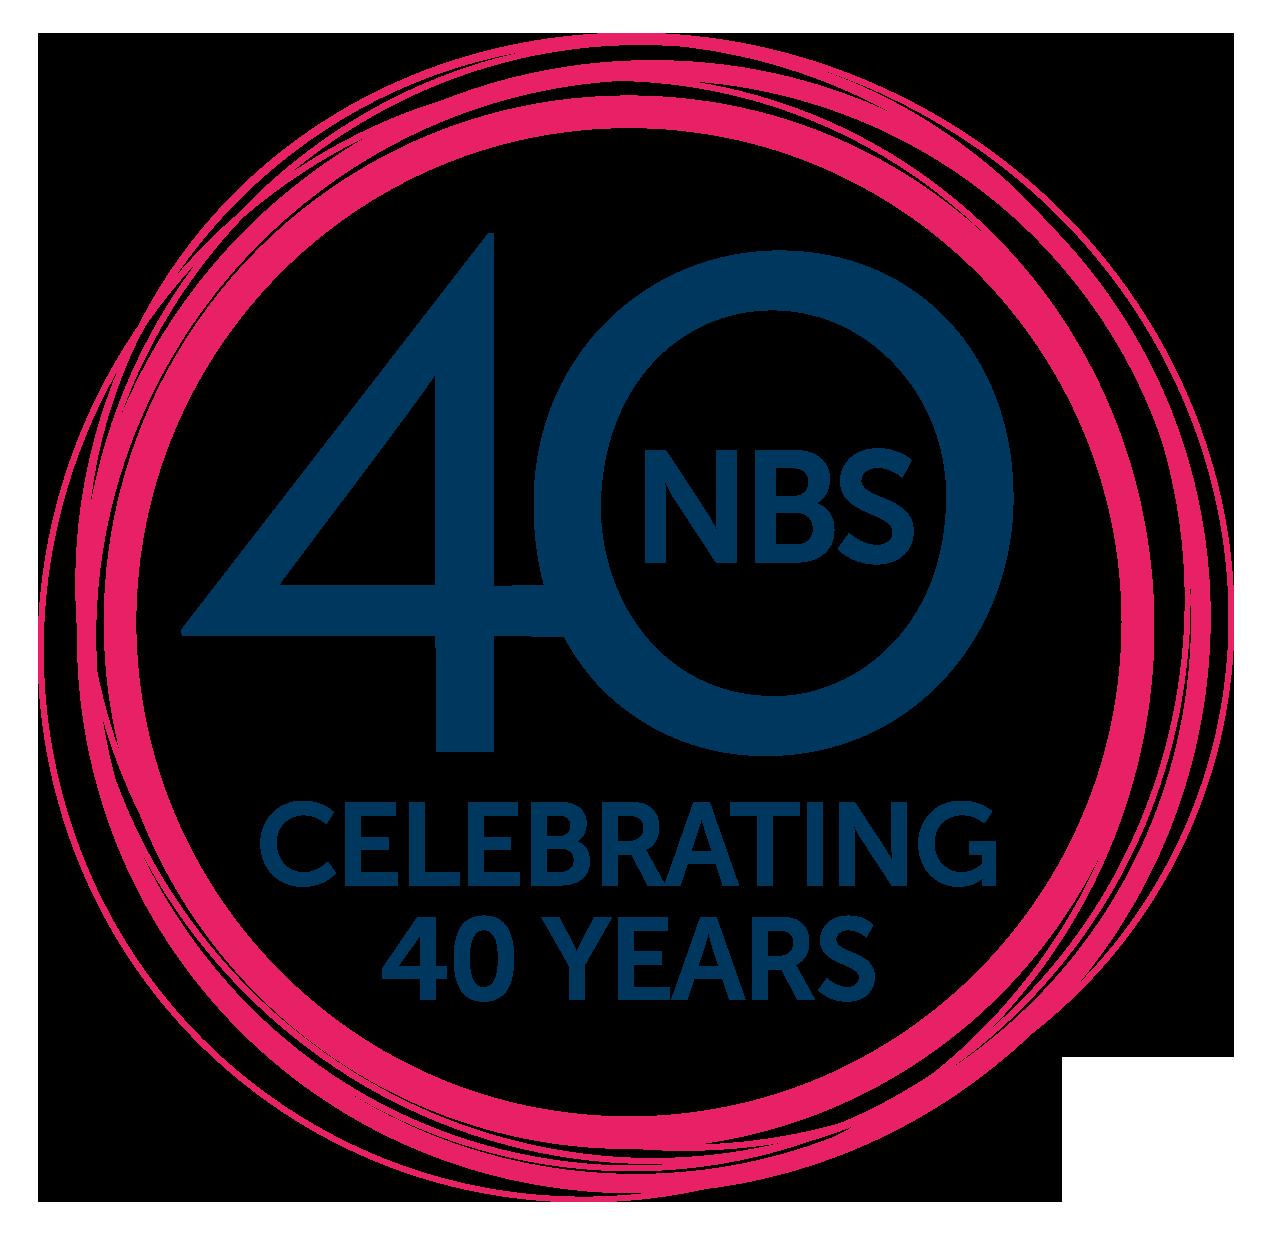 NBS 40 years logo